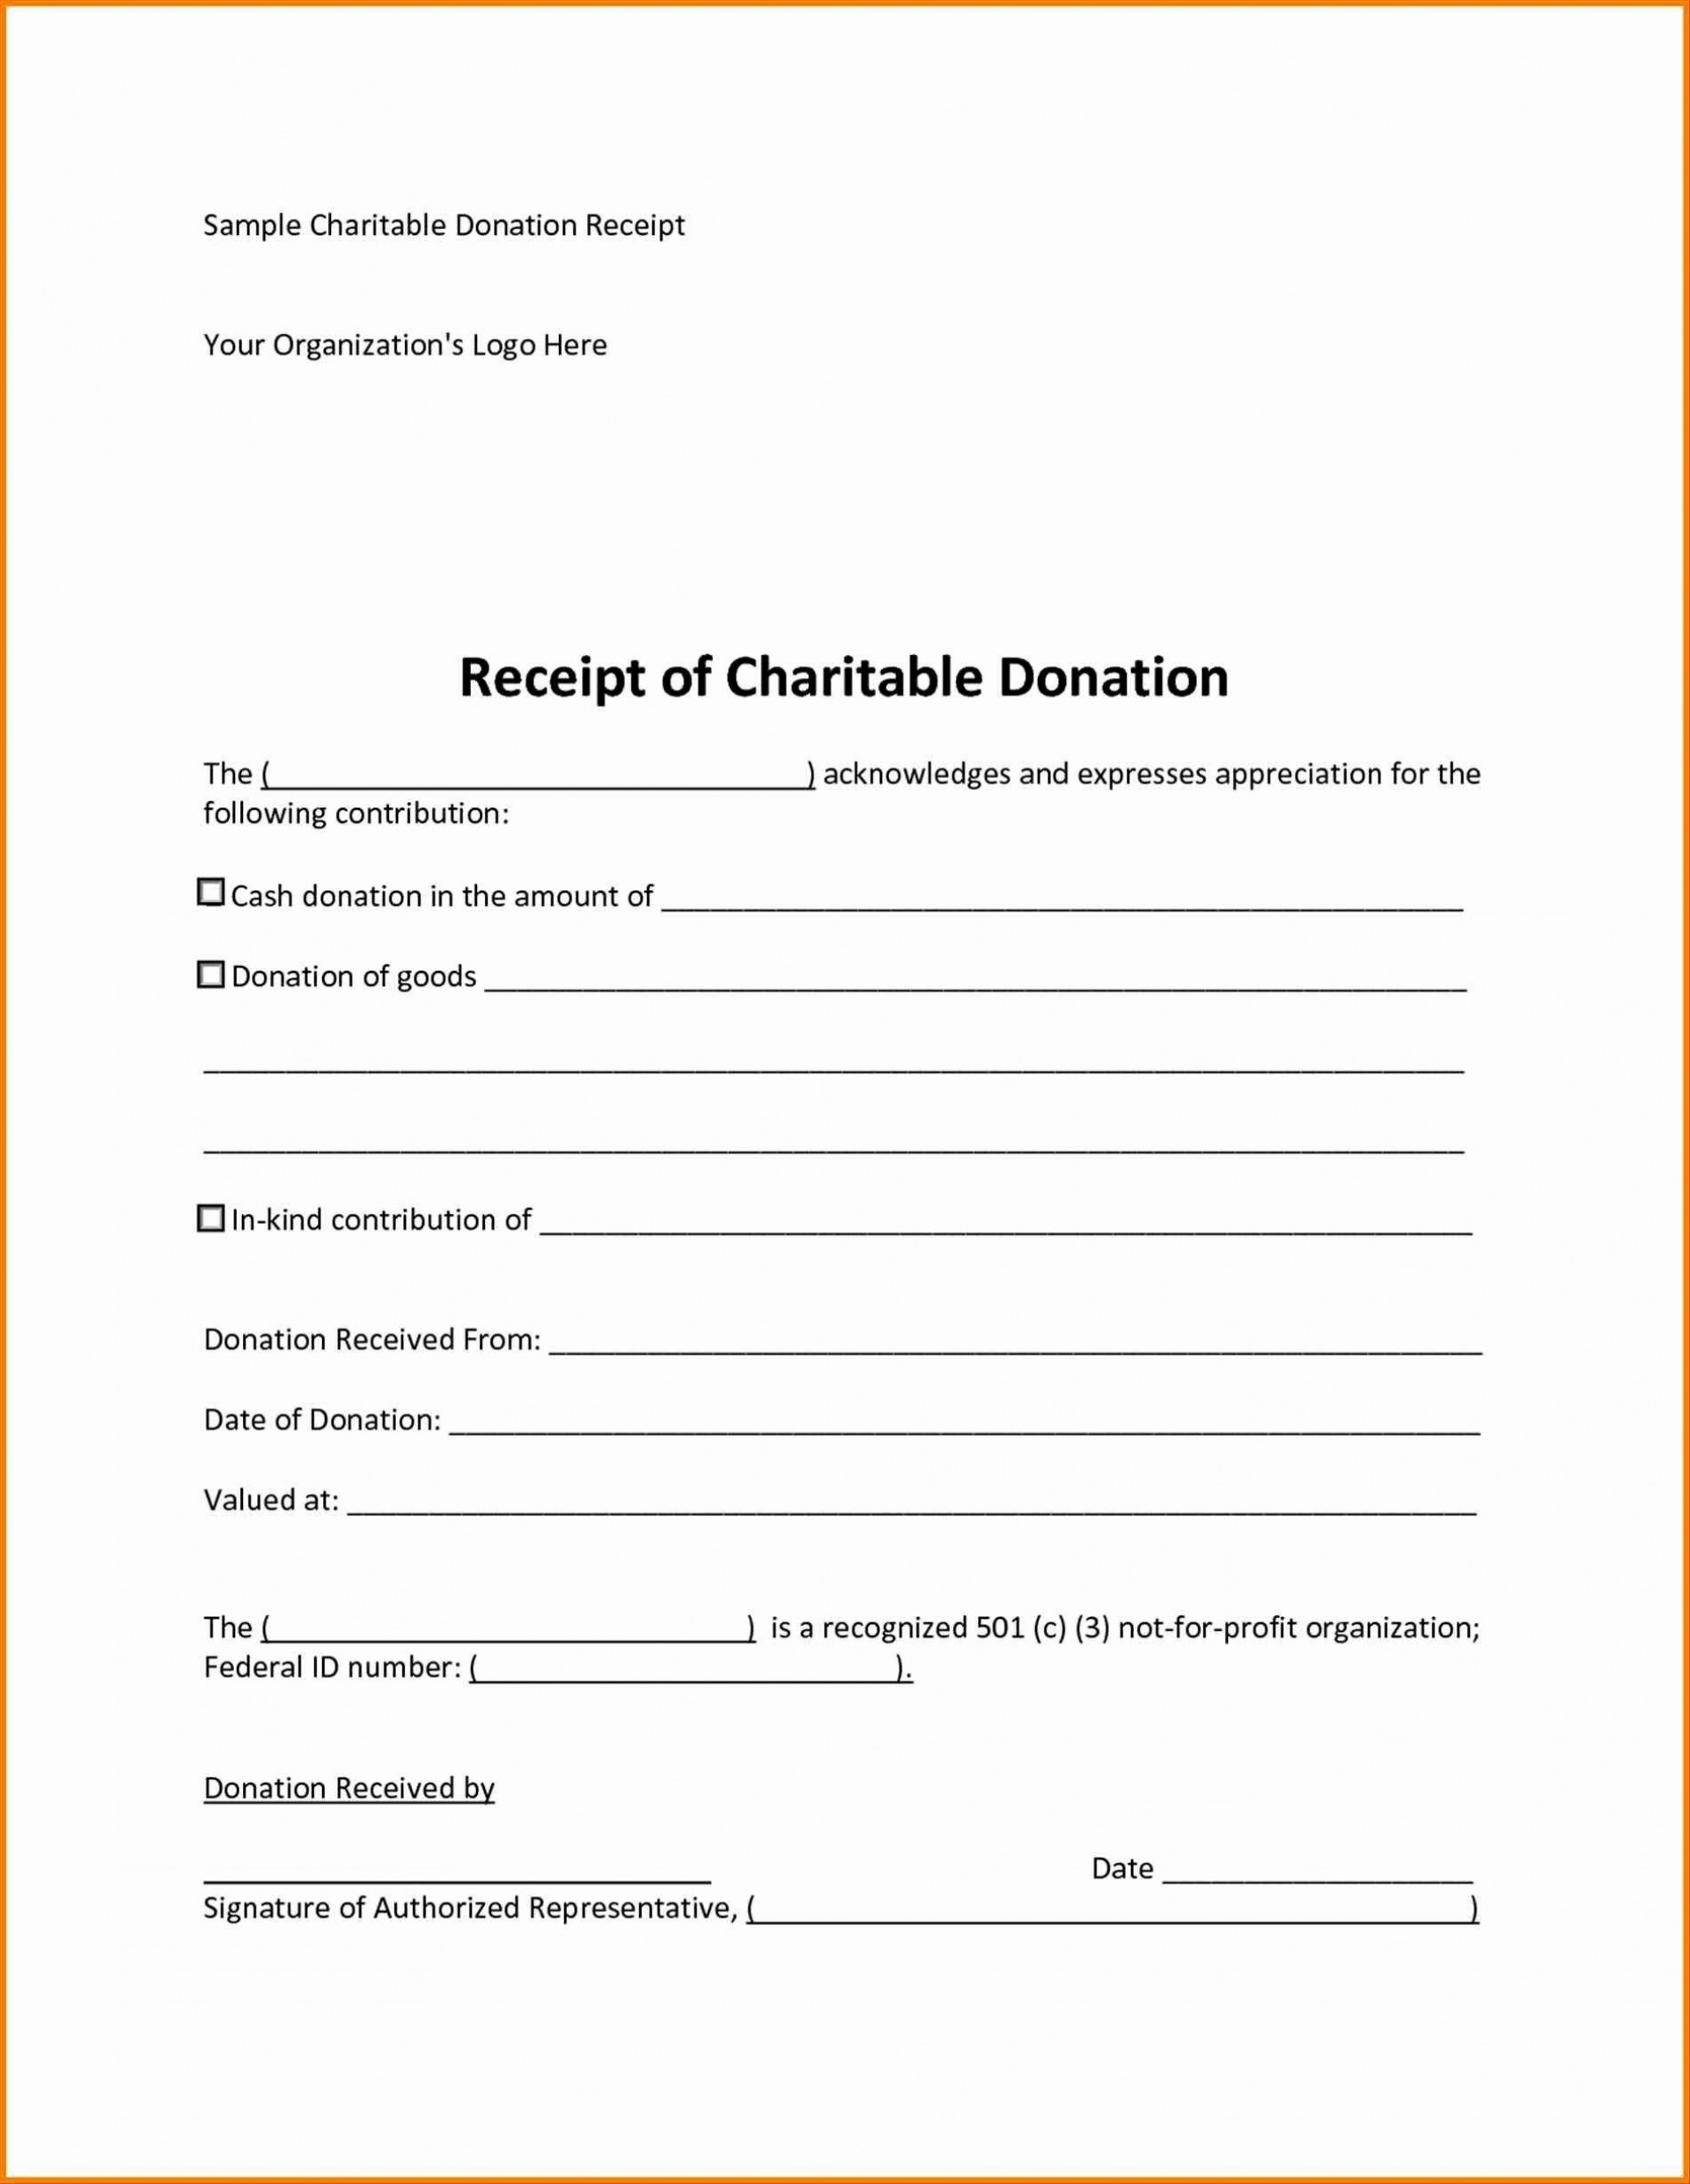 007 Magnificent Tax Donation Receipt Template Idea  Canadian Charitable Letter Church Deduction1920